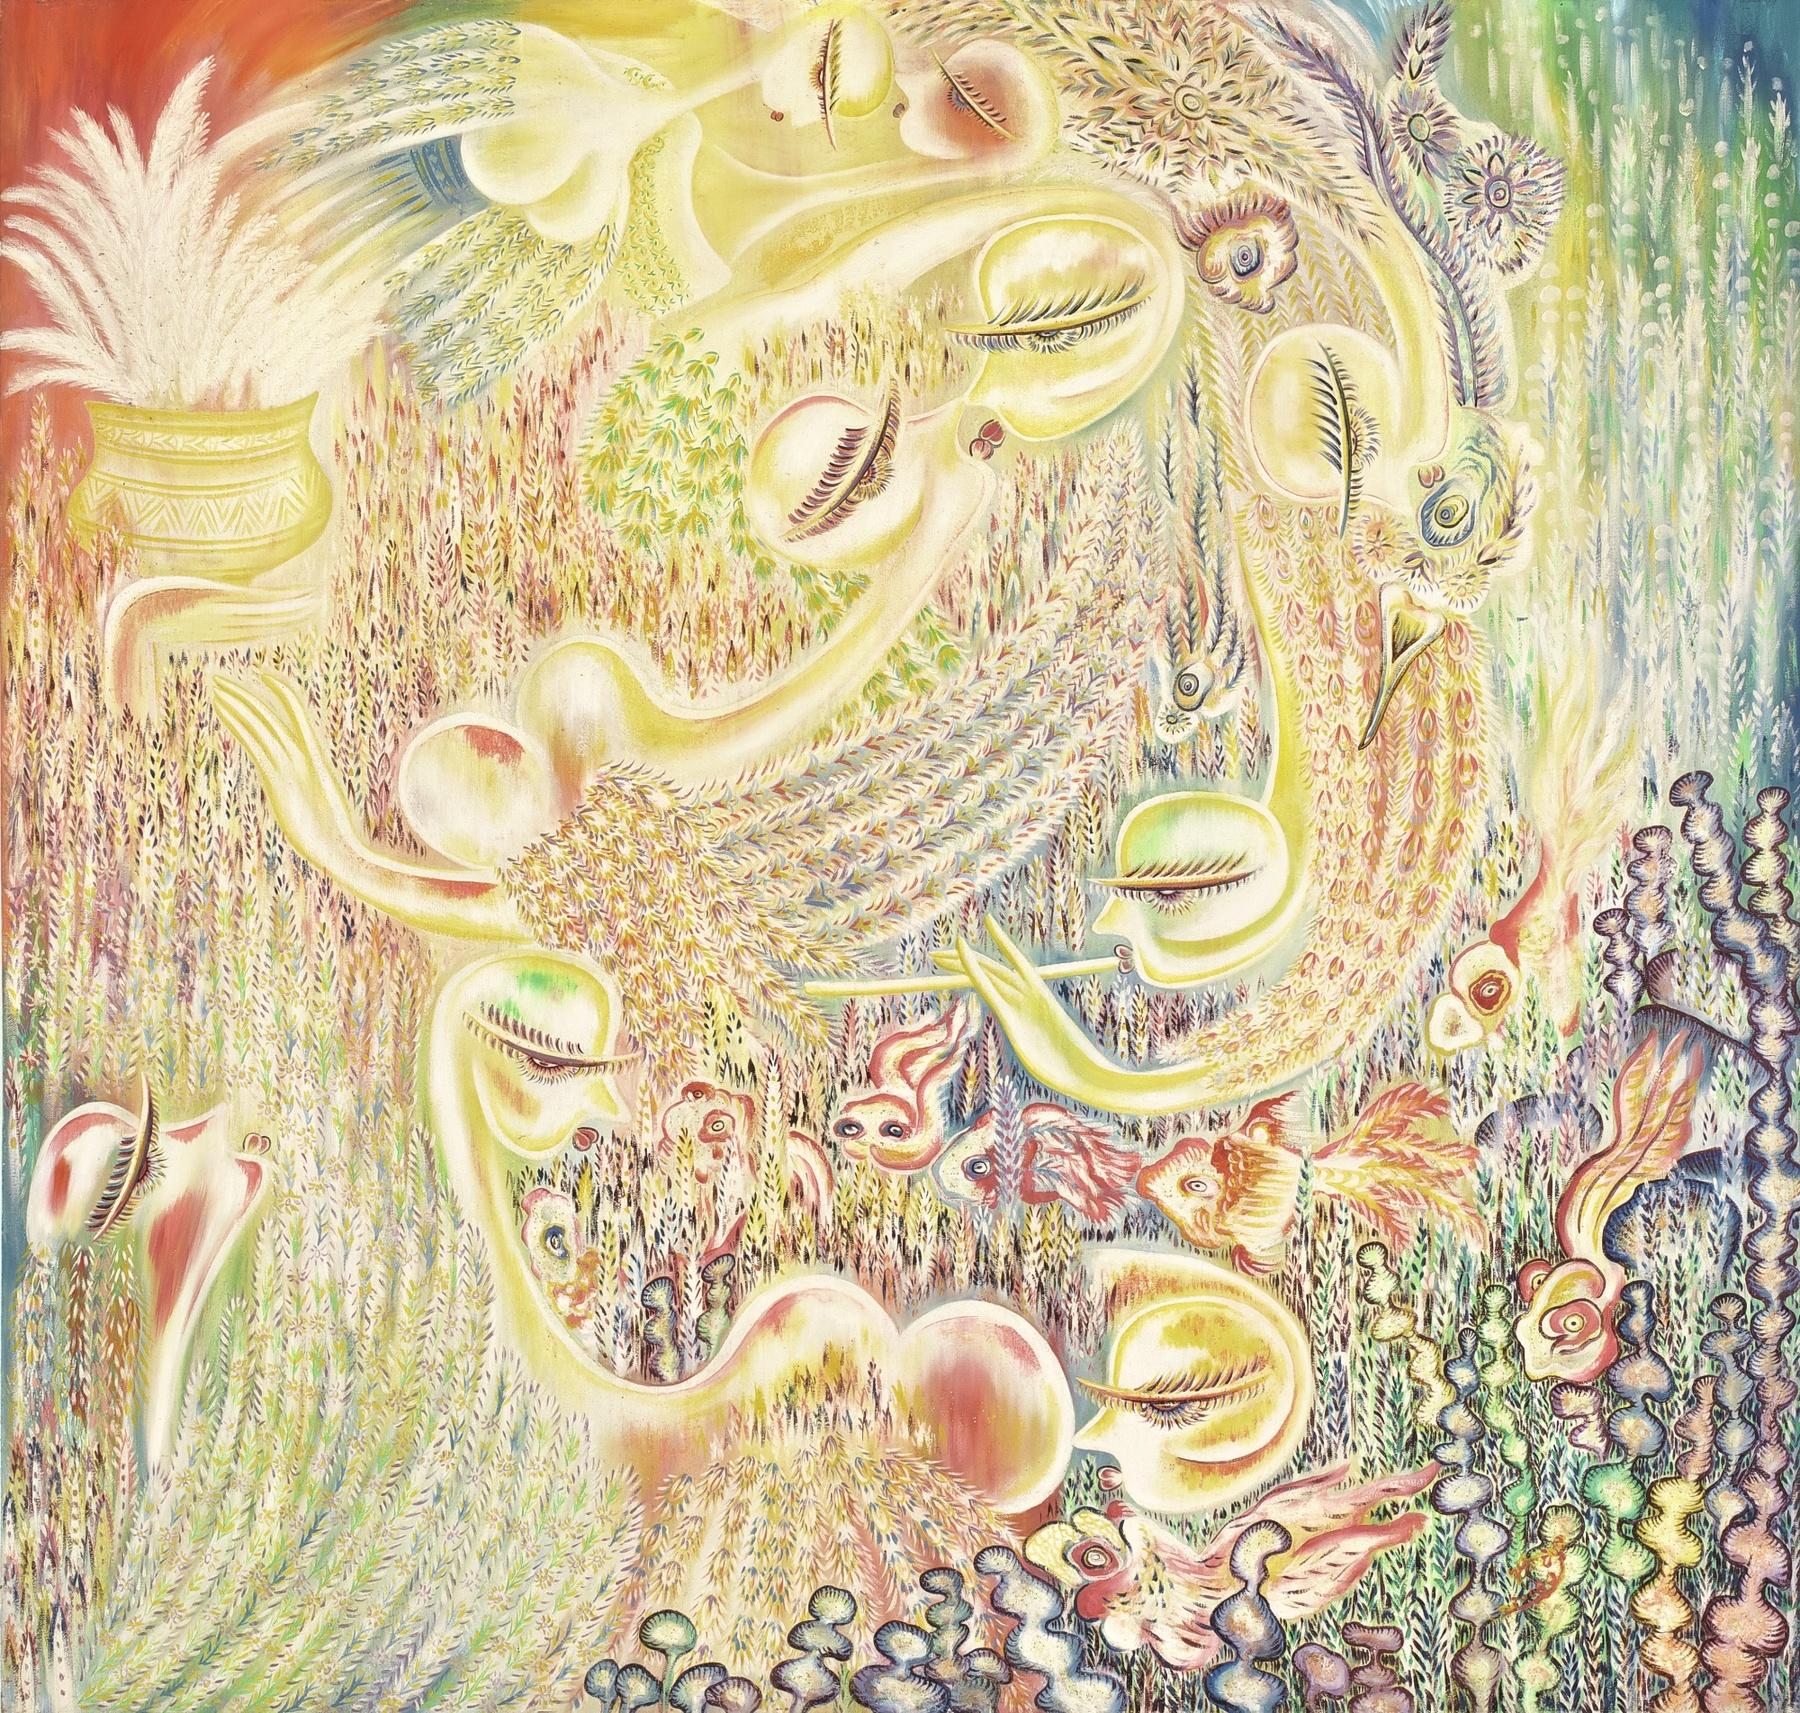 Lu Man-Heaven And Dream No. 1-2008